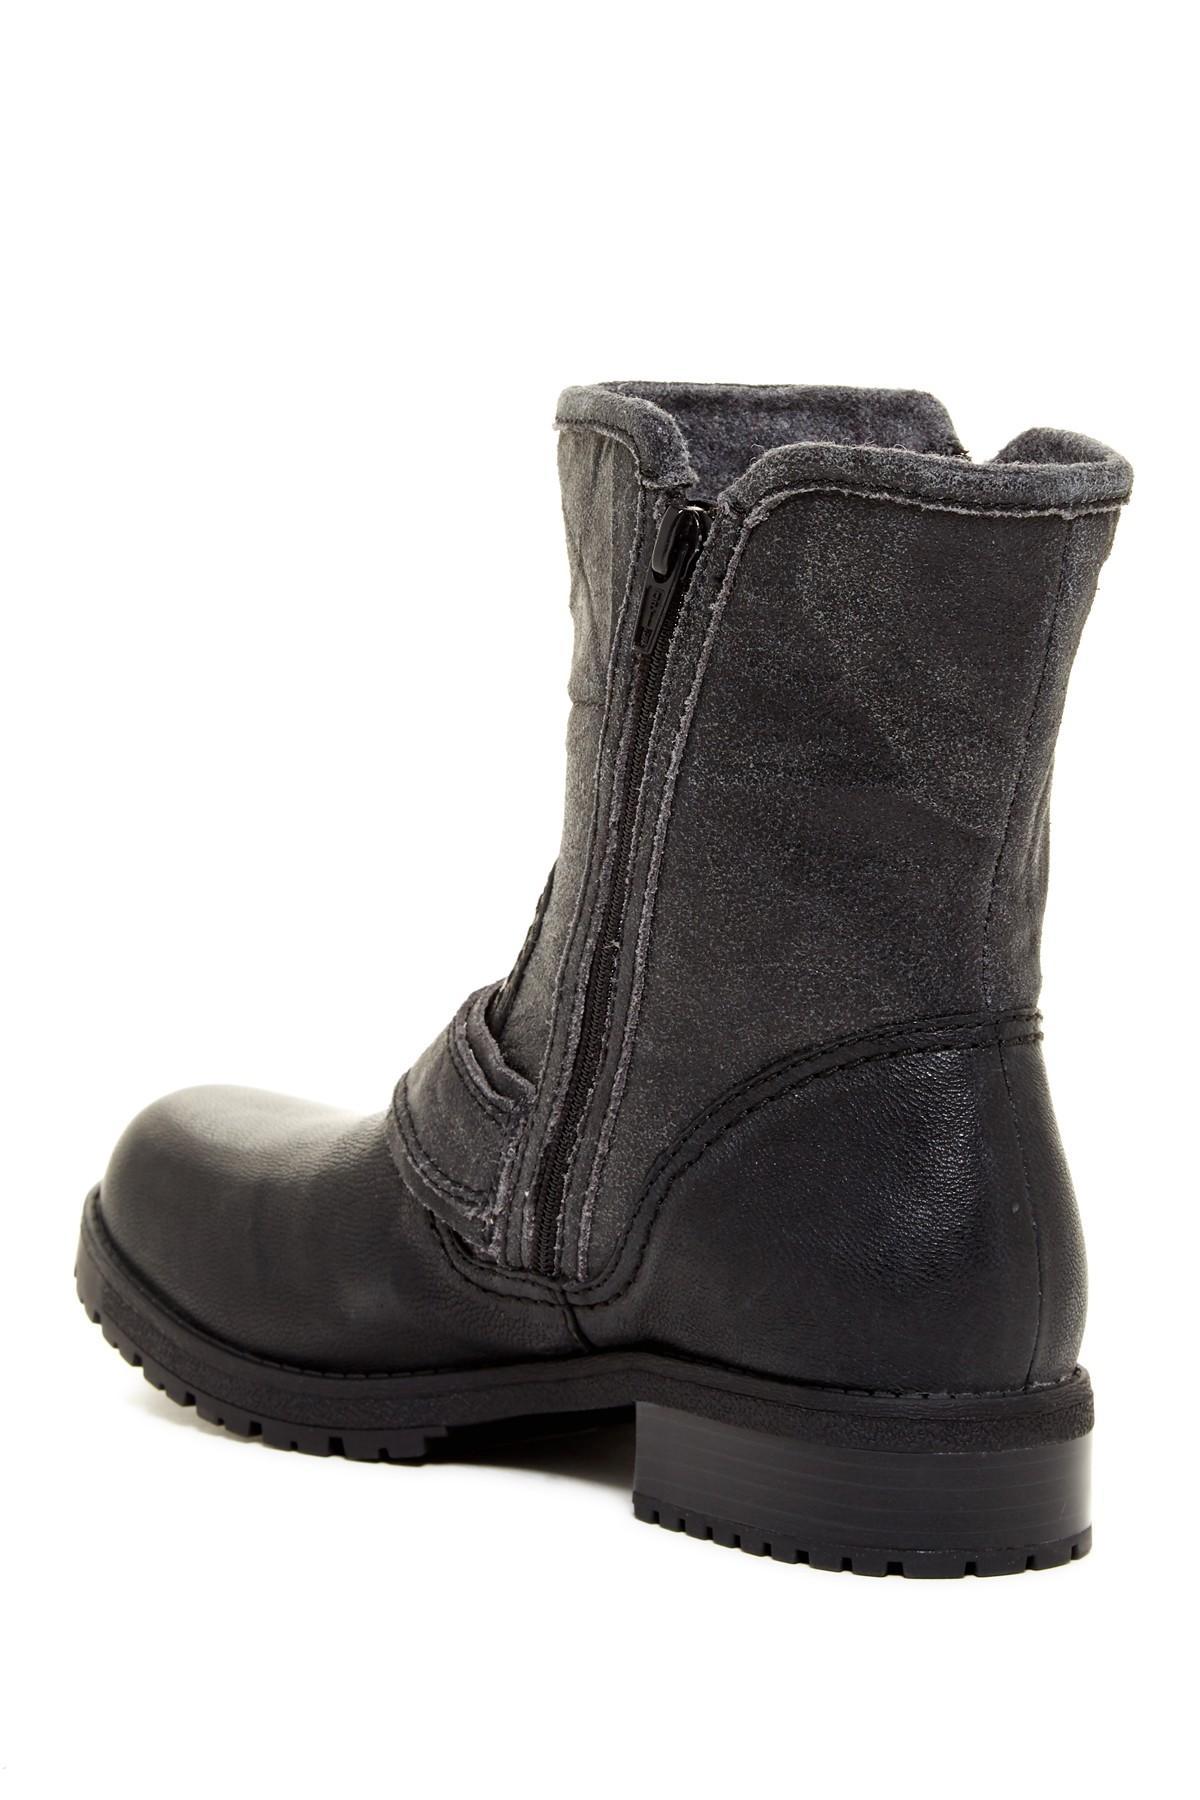 Born Shoes Wide Width